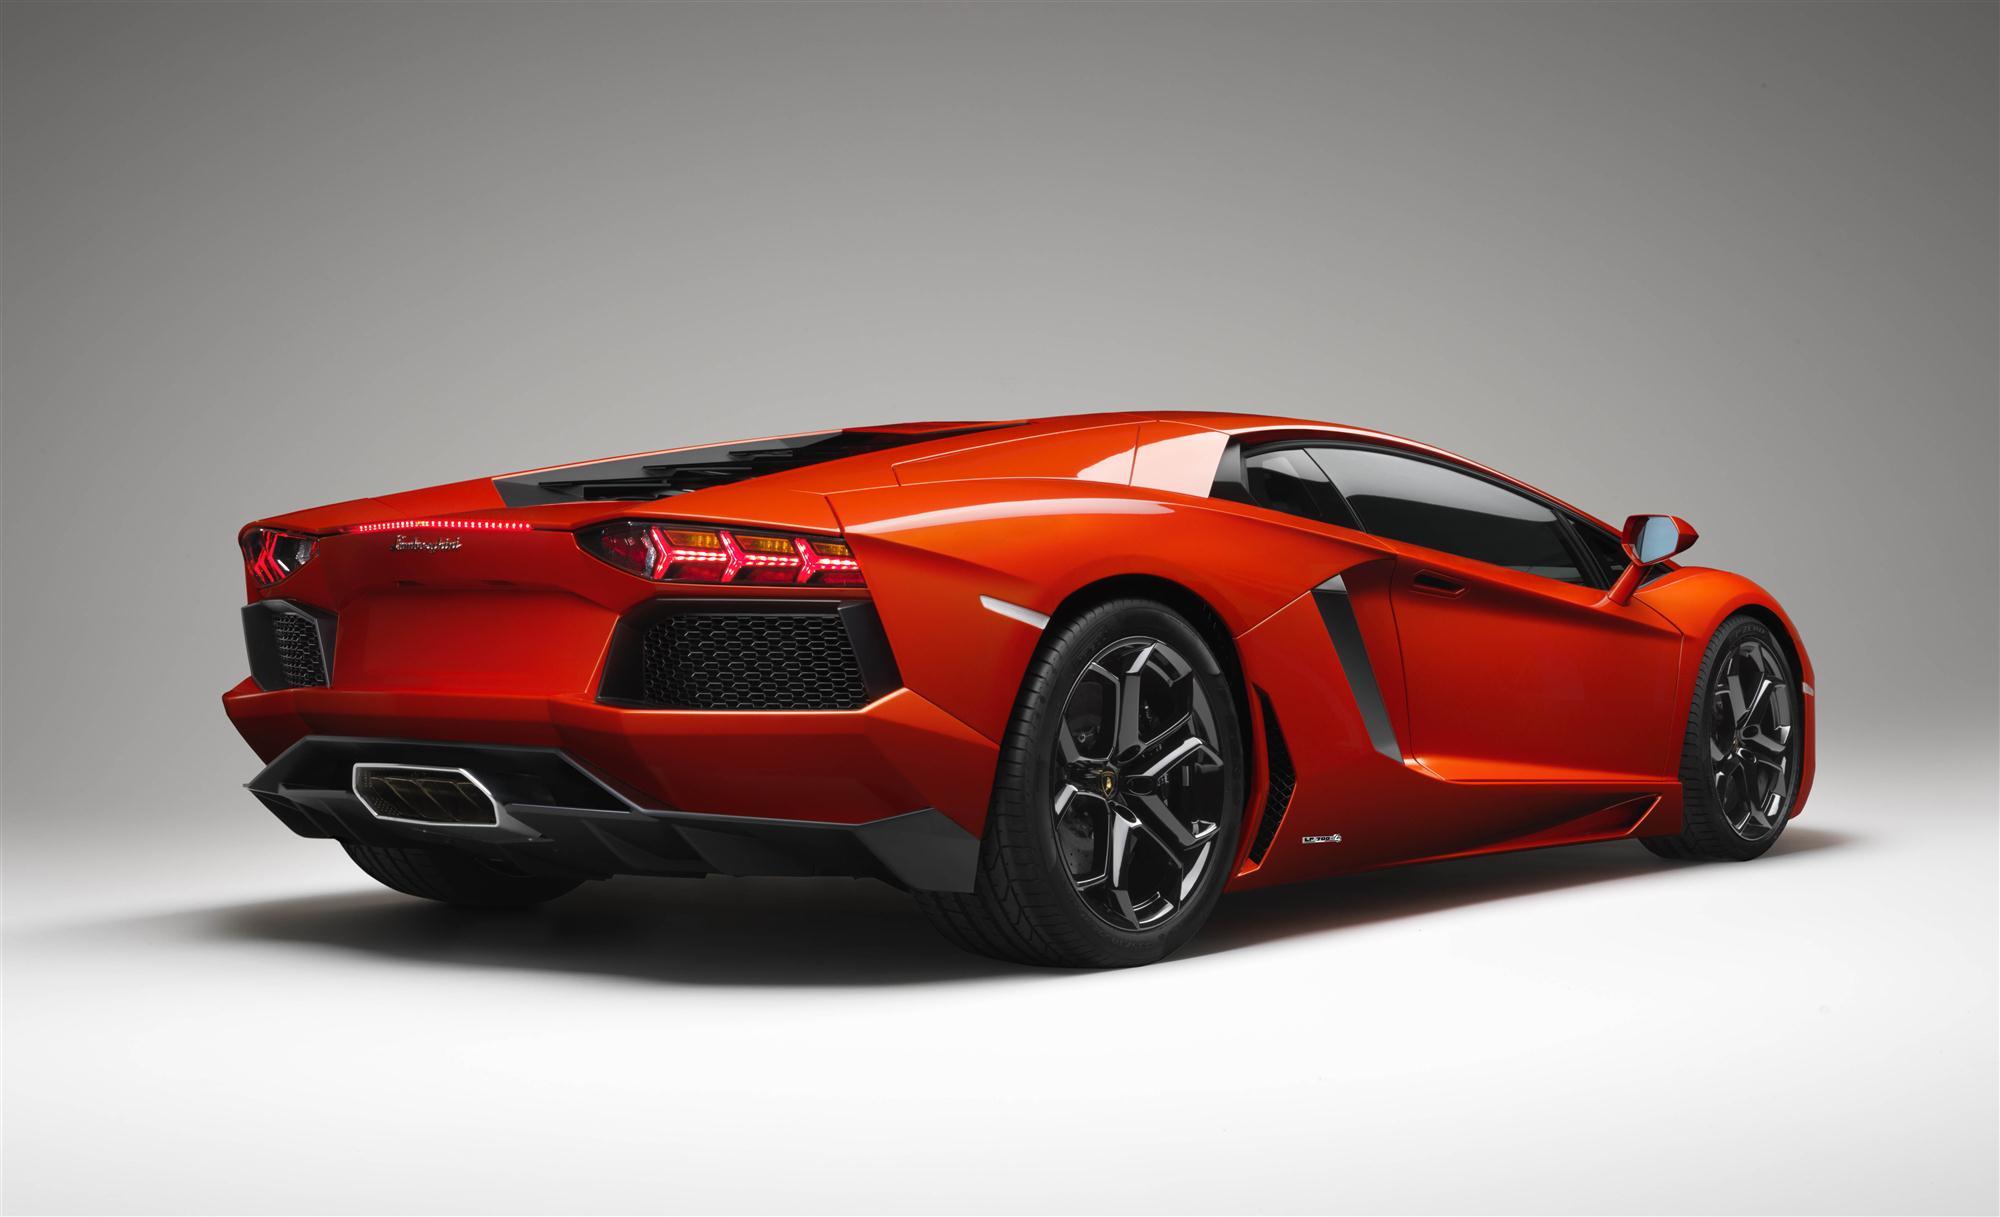 lamborghini-aventador-lp700-4_100342026_h Breathtaking Lamborghini Countach Owners Manual Pdf Cars Trend